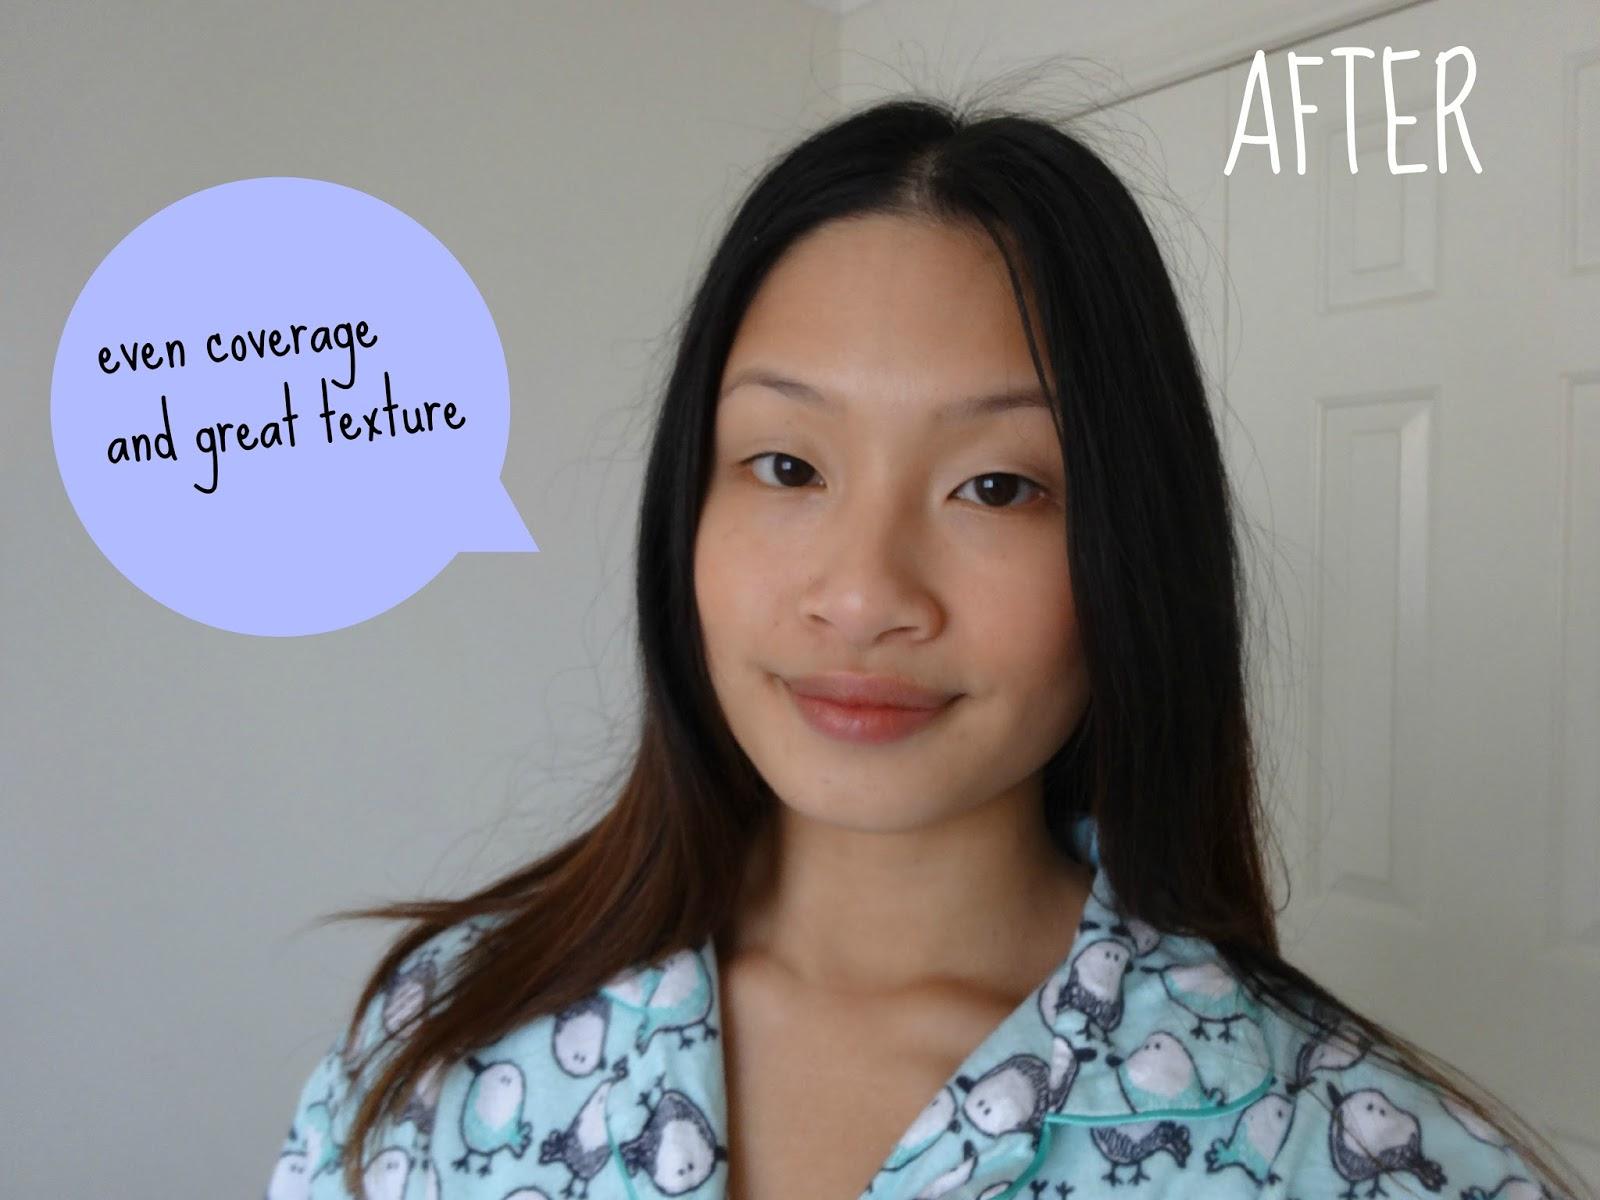 Almay - Shade inteligente Mousse Maquillaje Comentarios